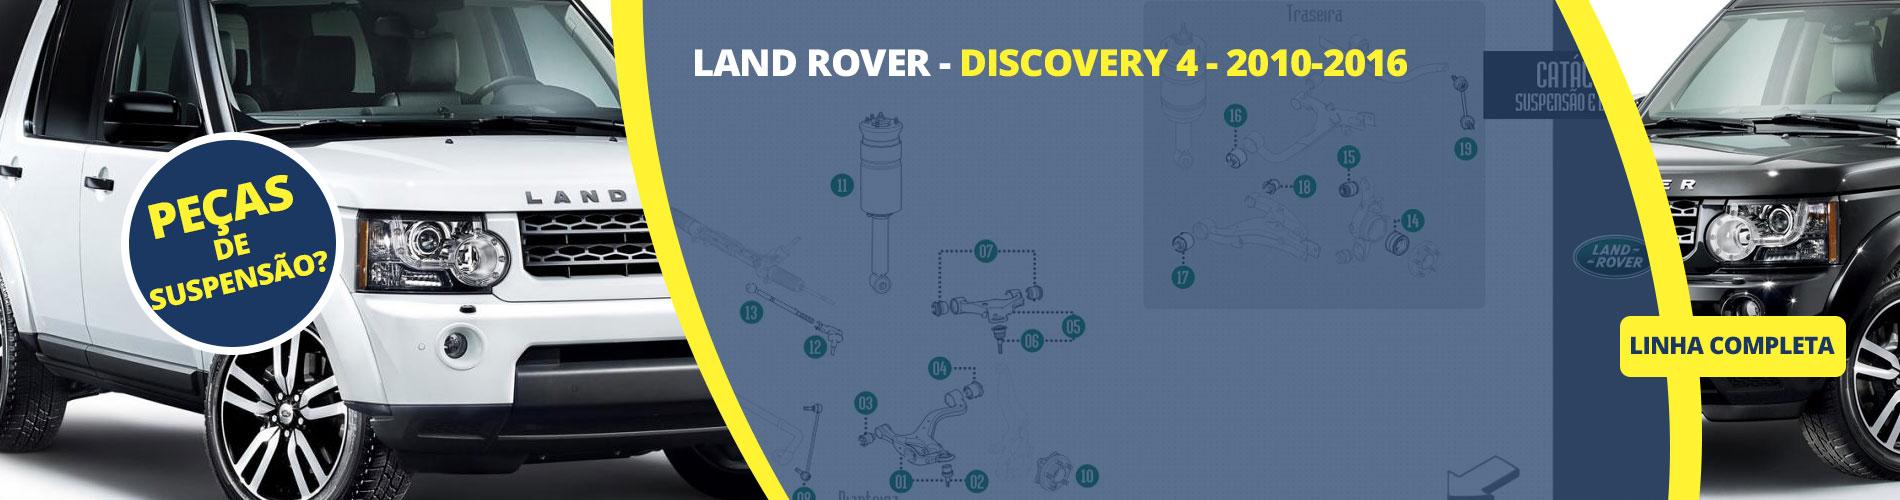 Catálogo LAND ROVER